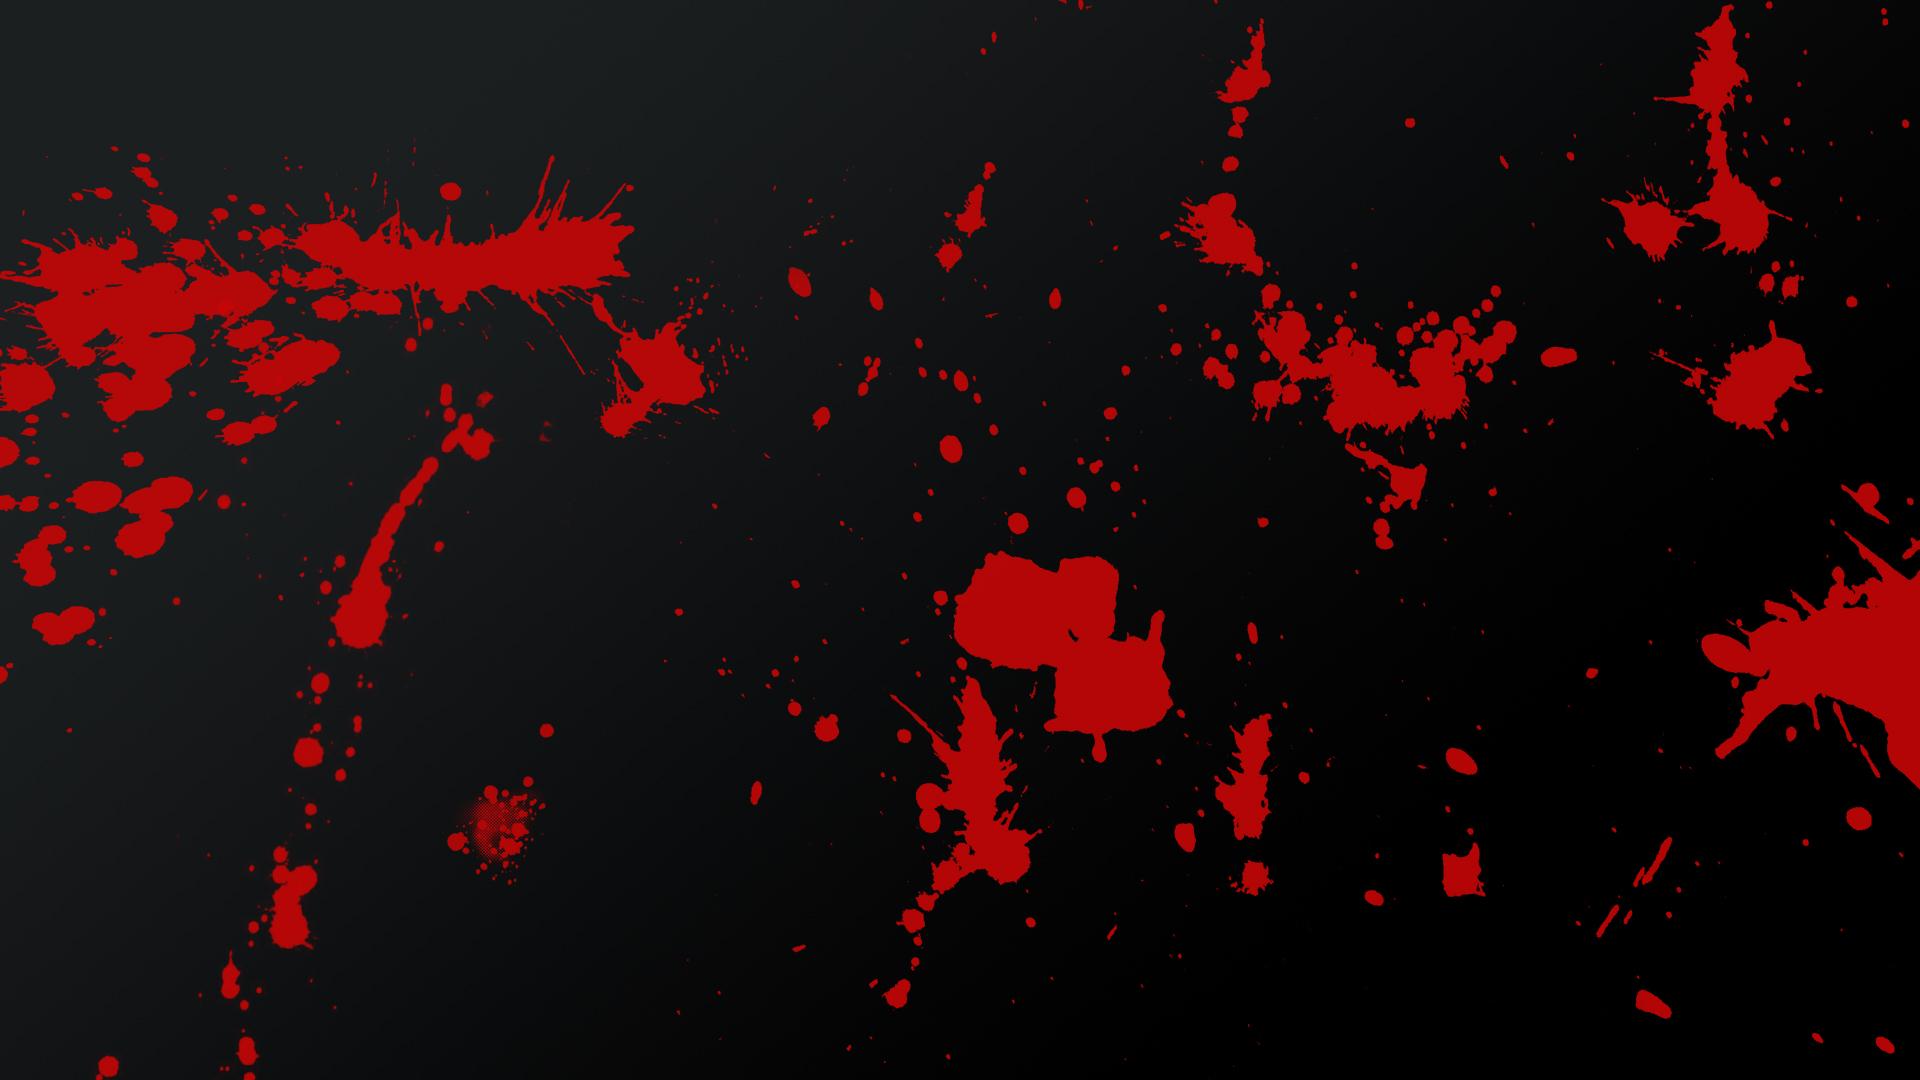 bloody splatter wallpaper -#main